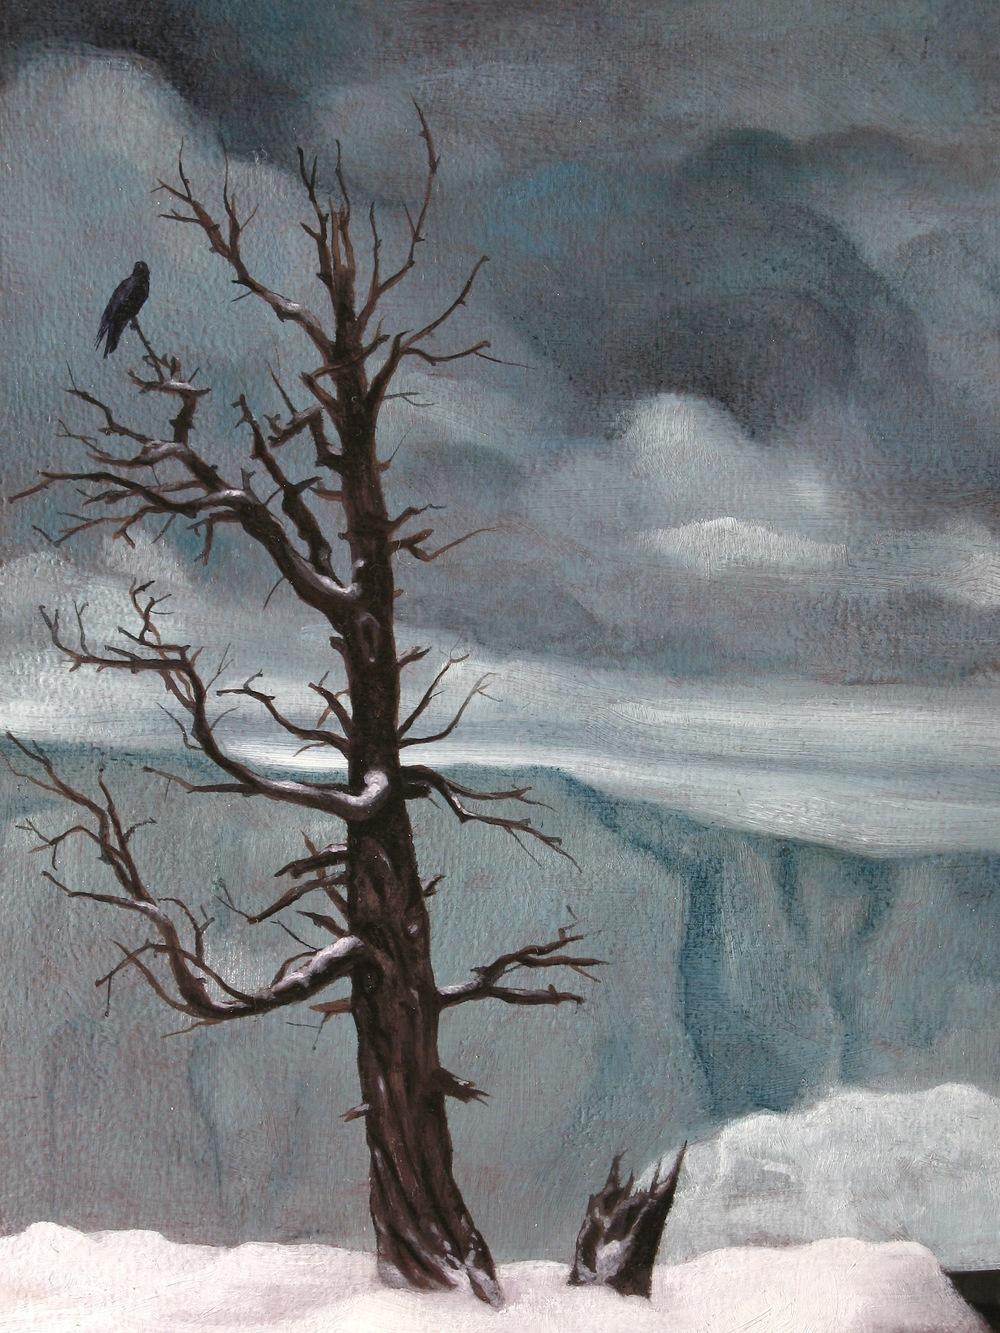 Snowfall (detail)